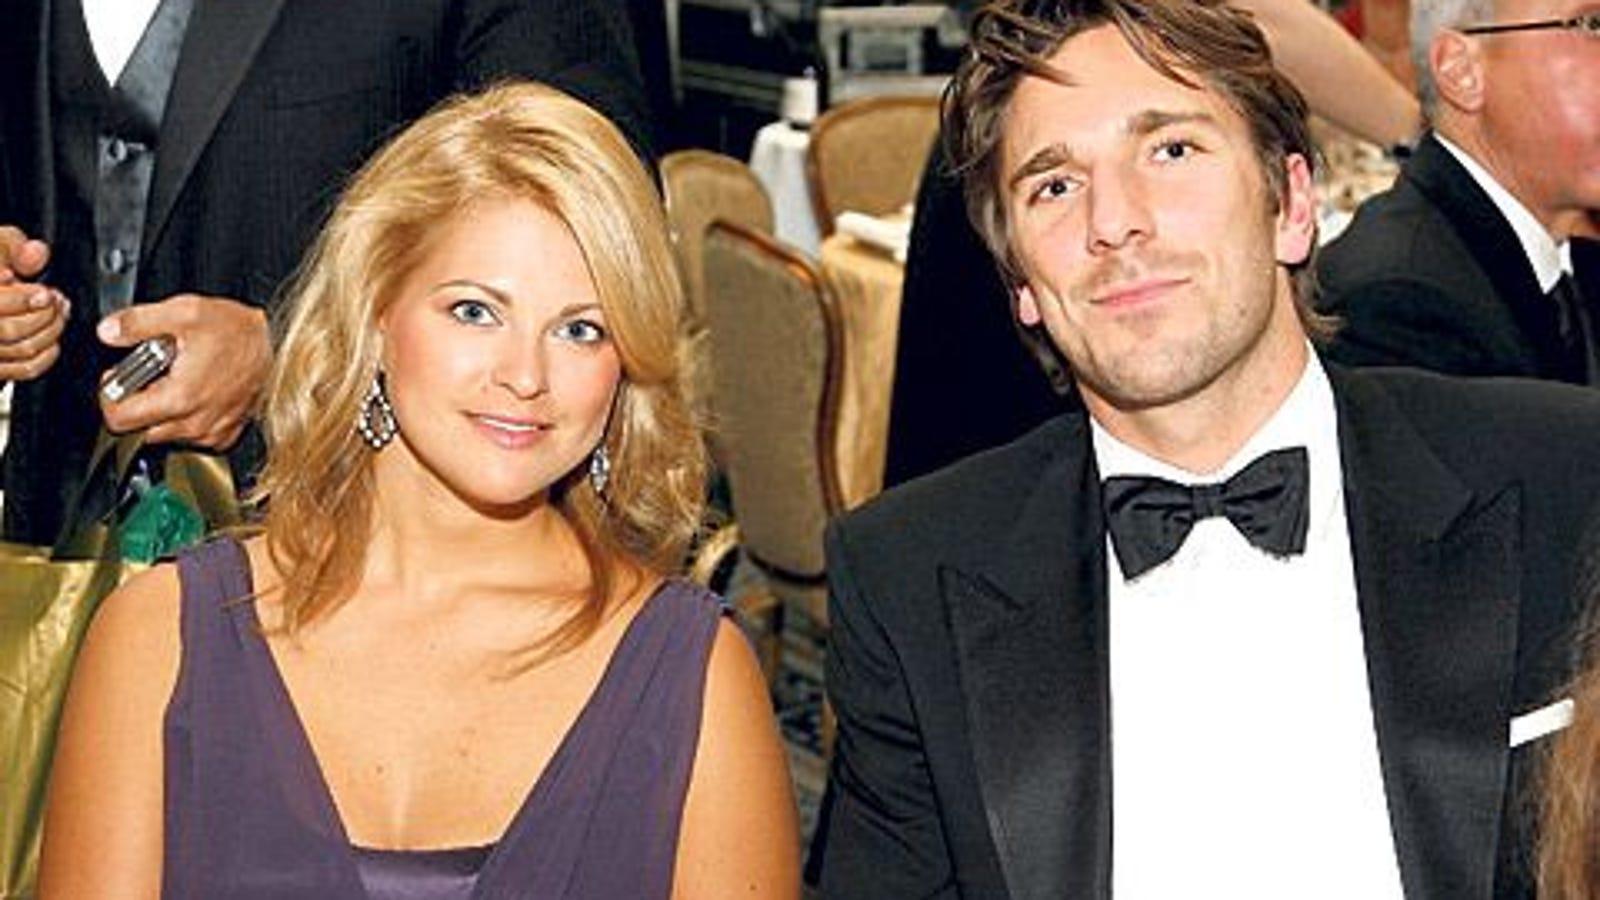 Henrik Lundqvist Possibly Making It With A Swedish Princess